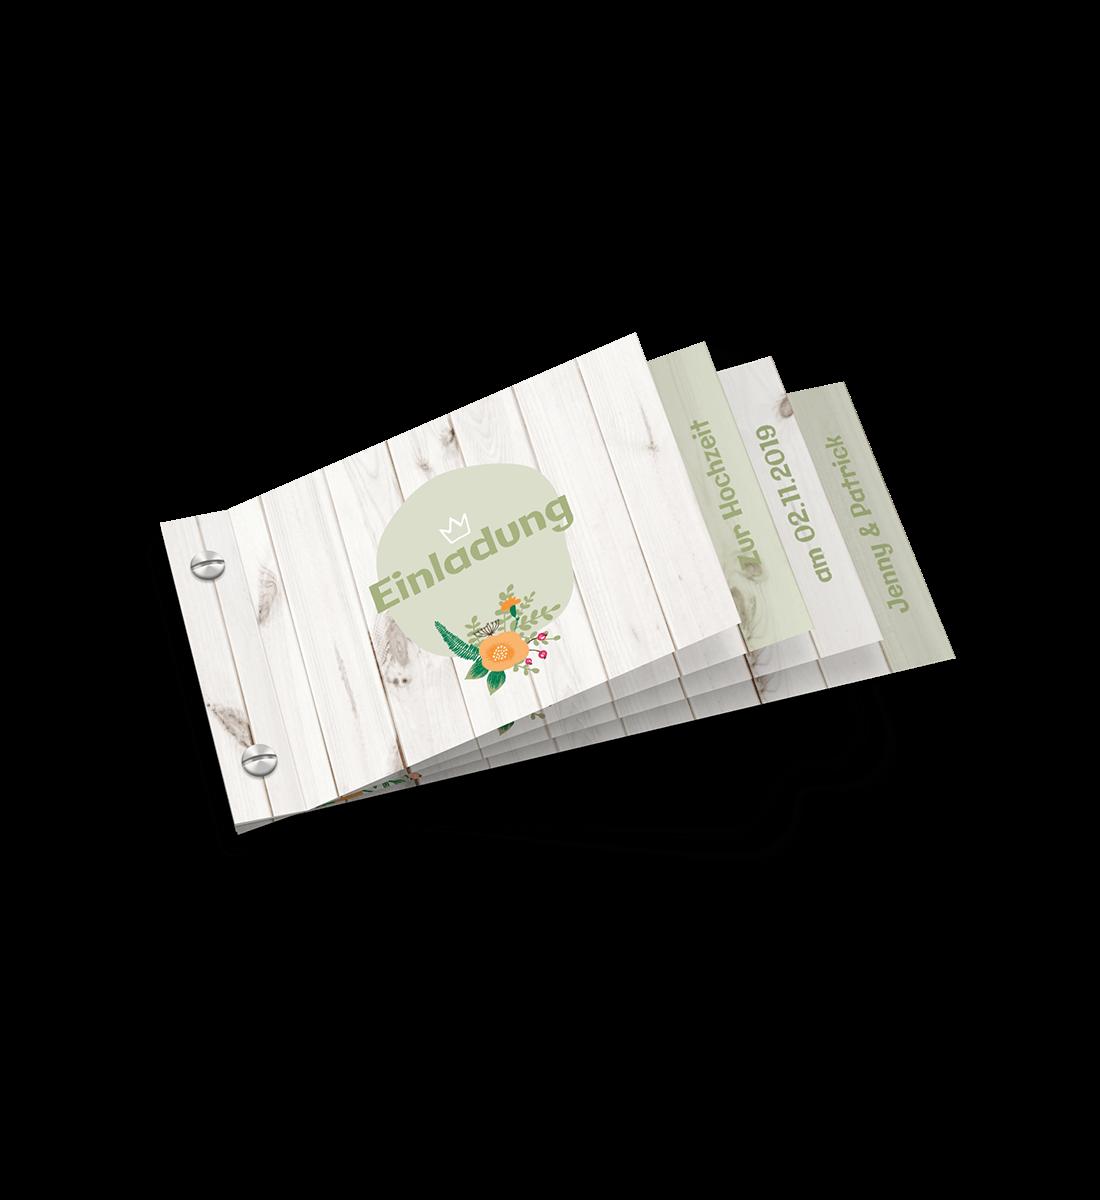 8-seitiger Kartenfächer